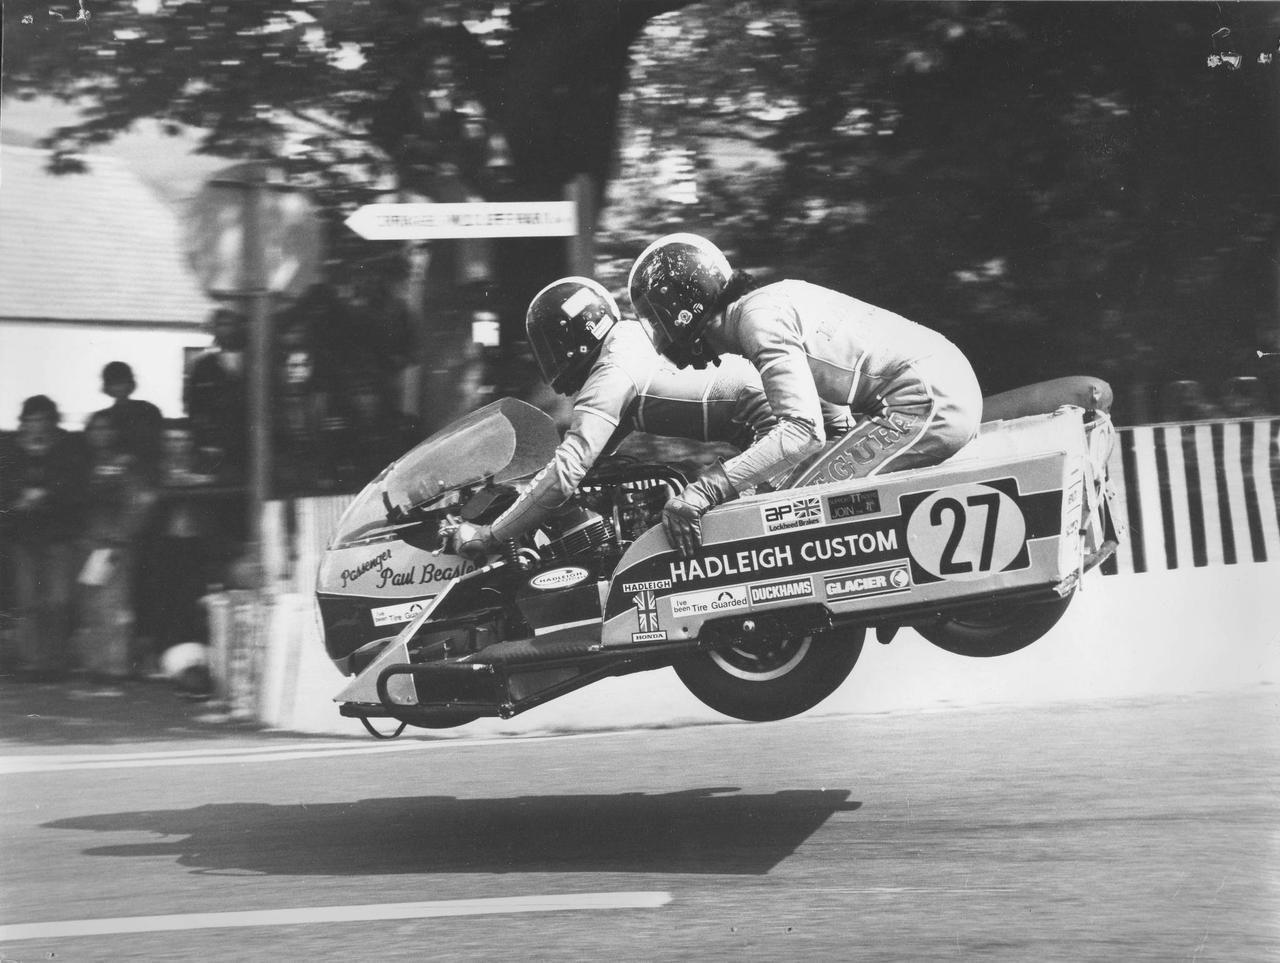 Jumping sidecar.